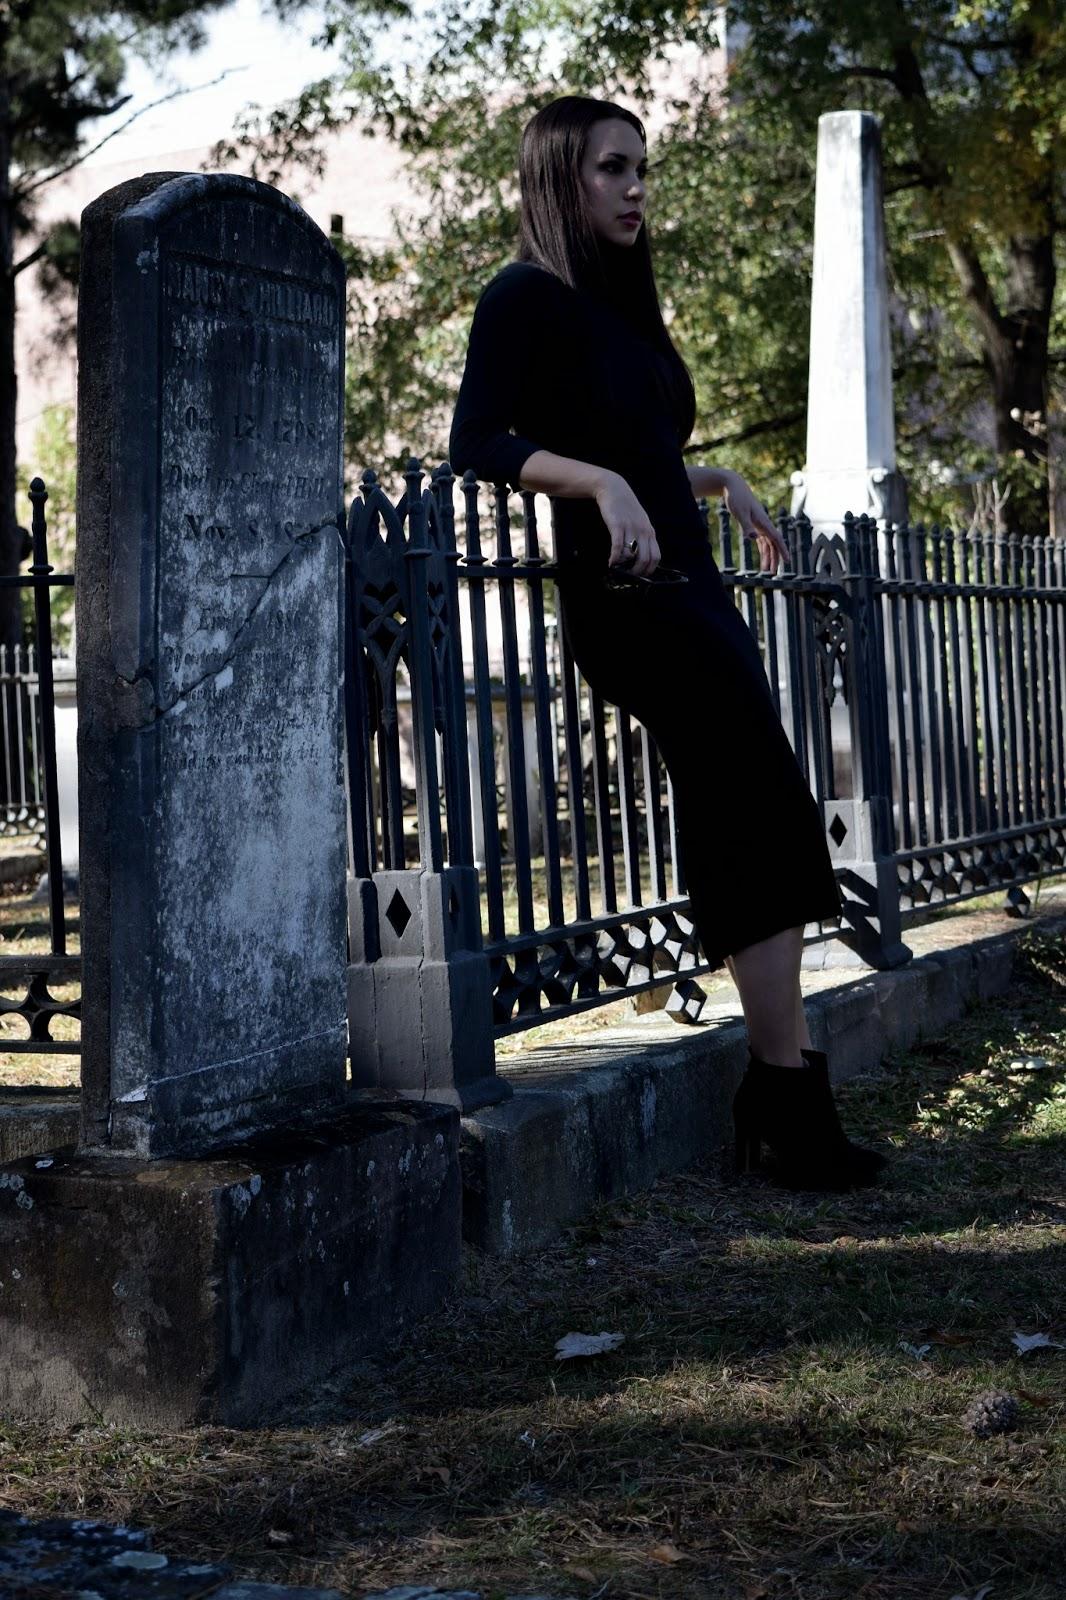 Mel in Chanel, Chanel, Zara, Kim Kardashian, Audrey Hepburn, Rick Owens, midi, midi skirt, Givenchy, all black, black, neutral, Halloween, cemetery, Raleigh, Raleigh fashion, Raleigh blogger, blogger, fashion blogger